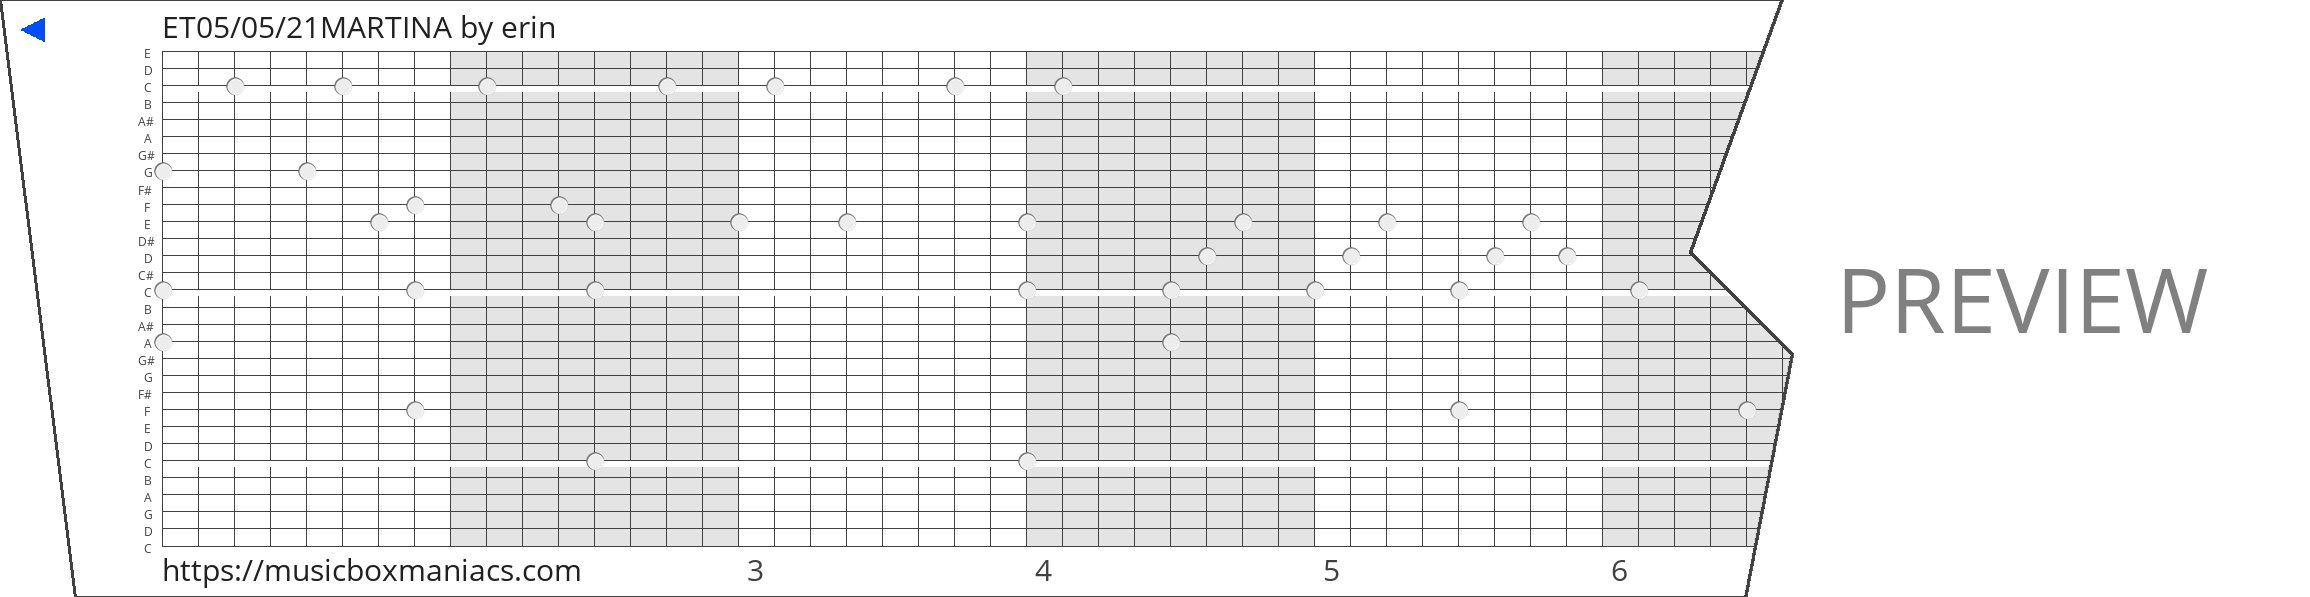 ET05/05/21MARTINA 30 note music box paper strip